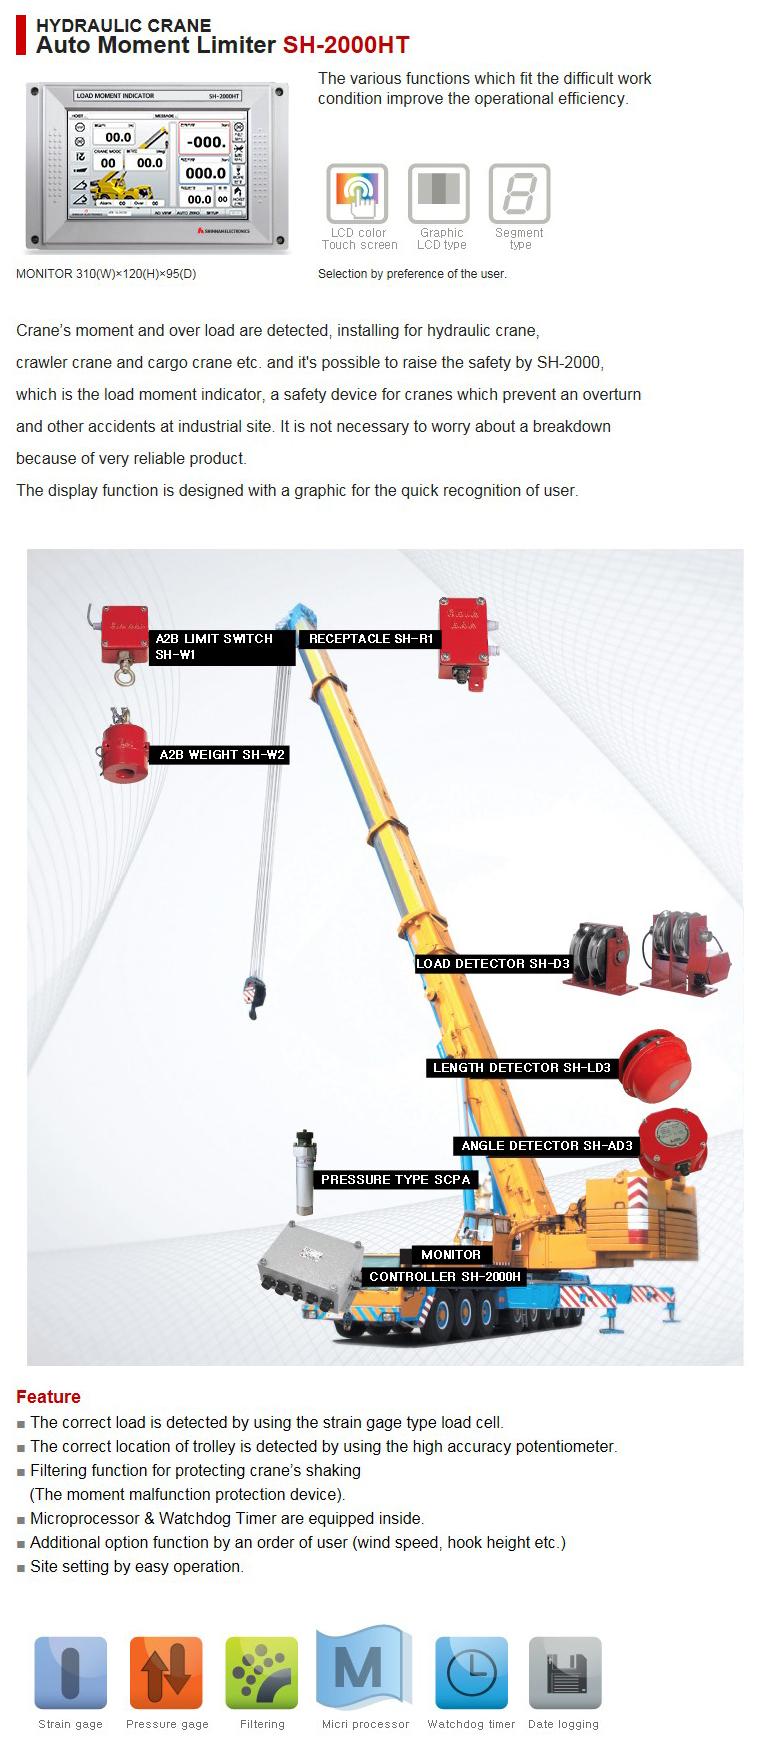 SHINHAN ELECTRIONICS Hydraulic Crane Auto Moment Limiter SH-2000HT